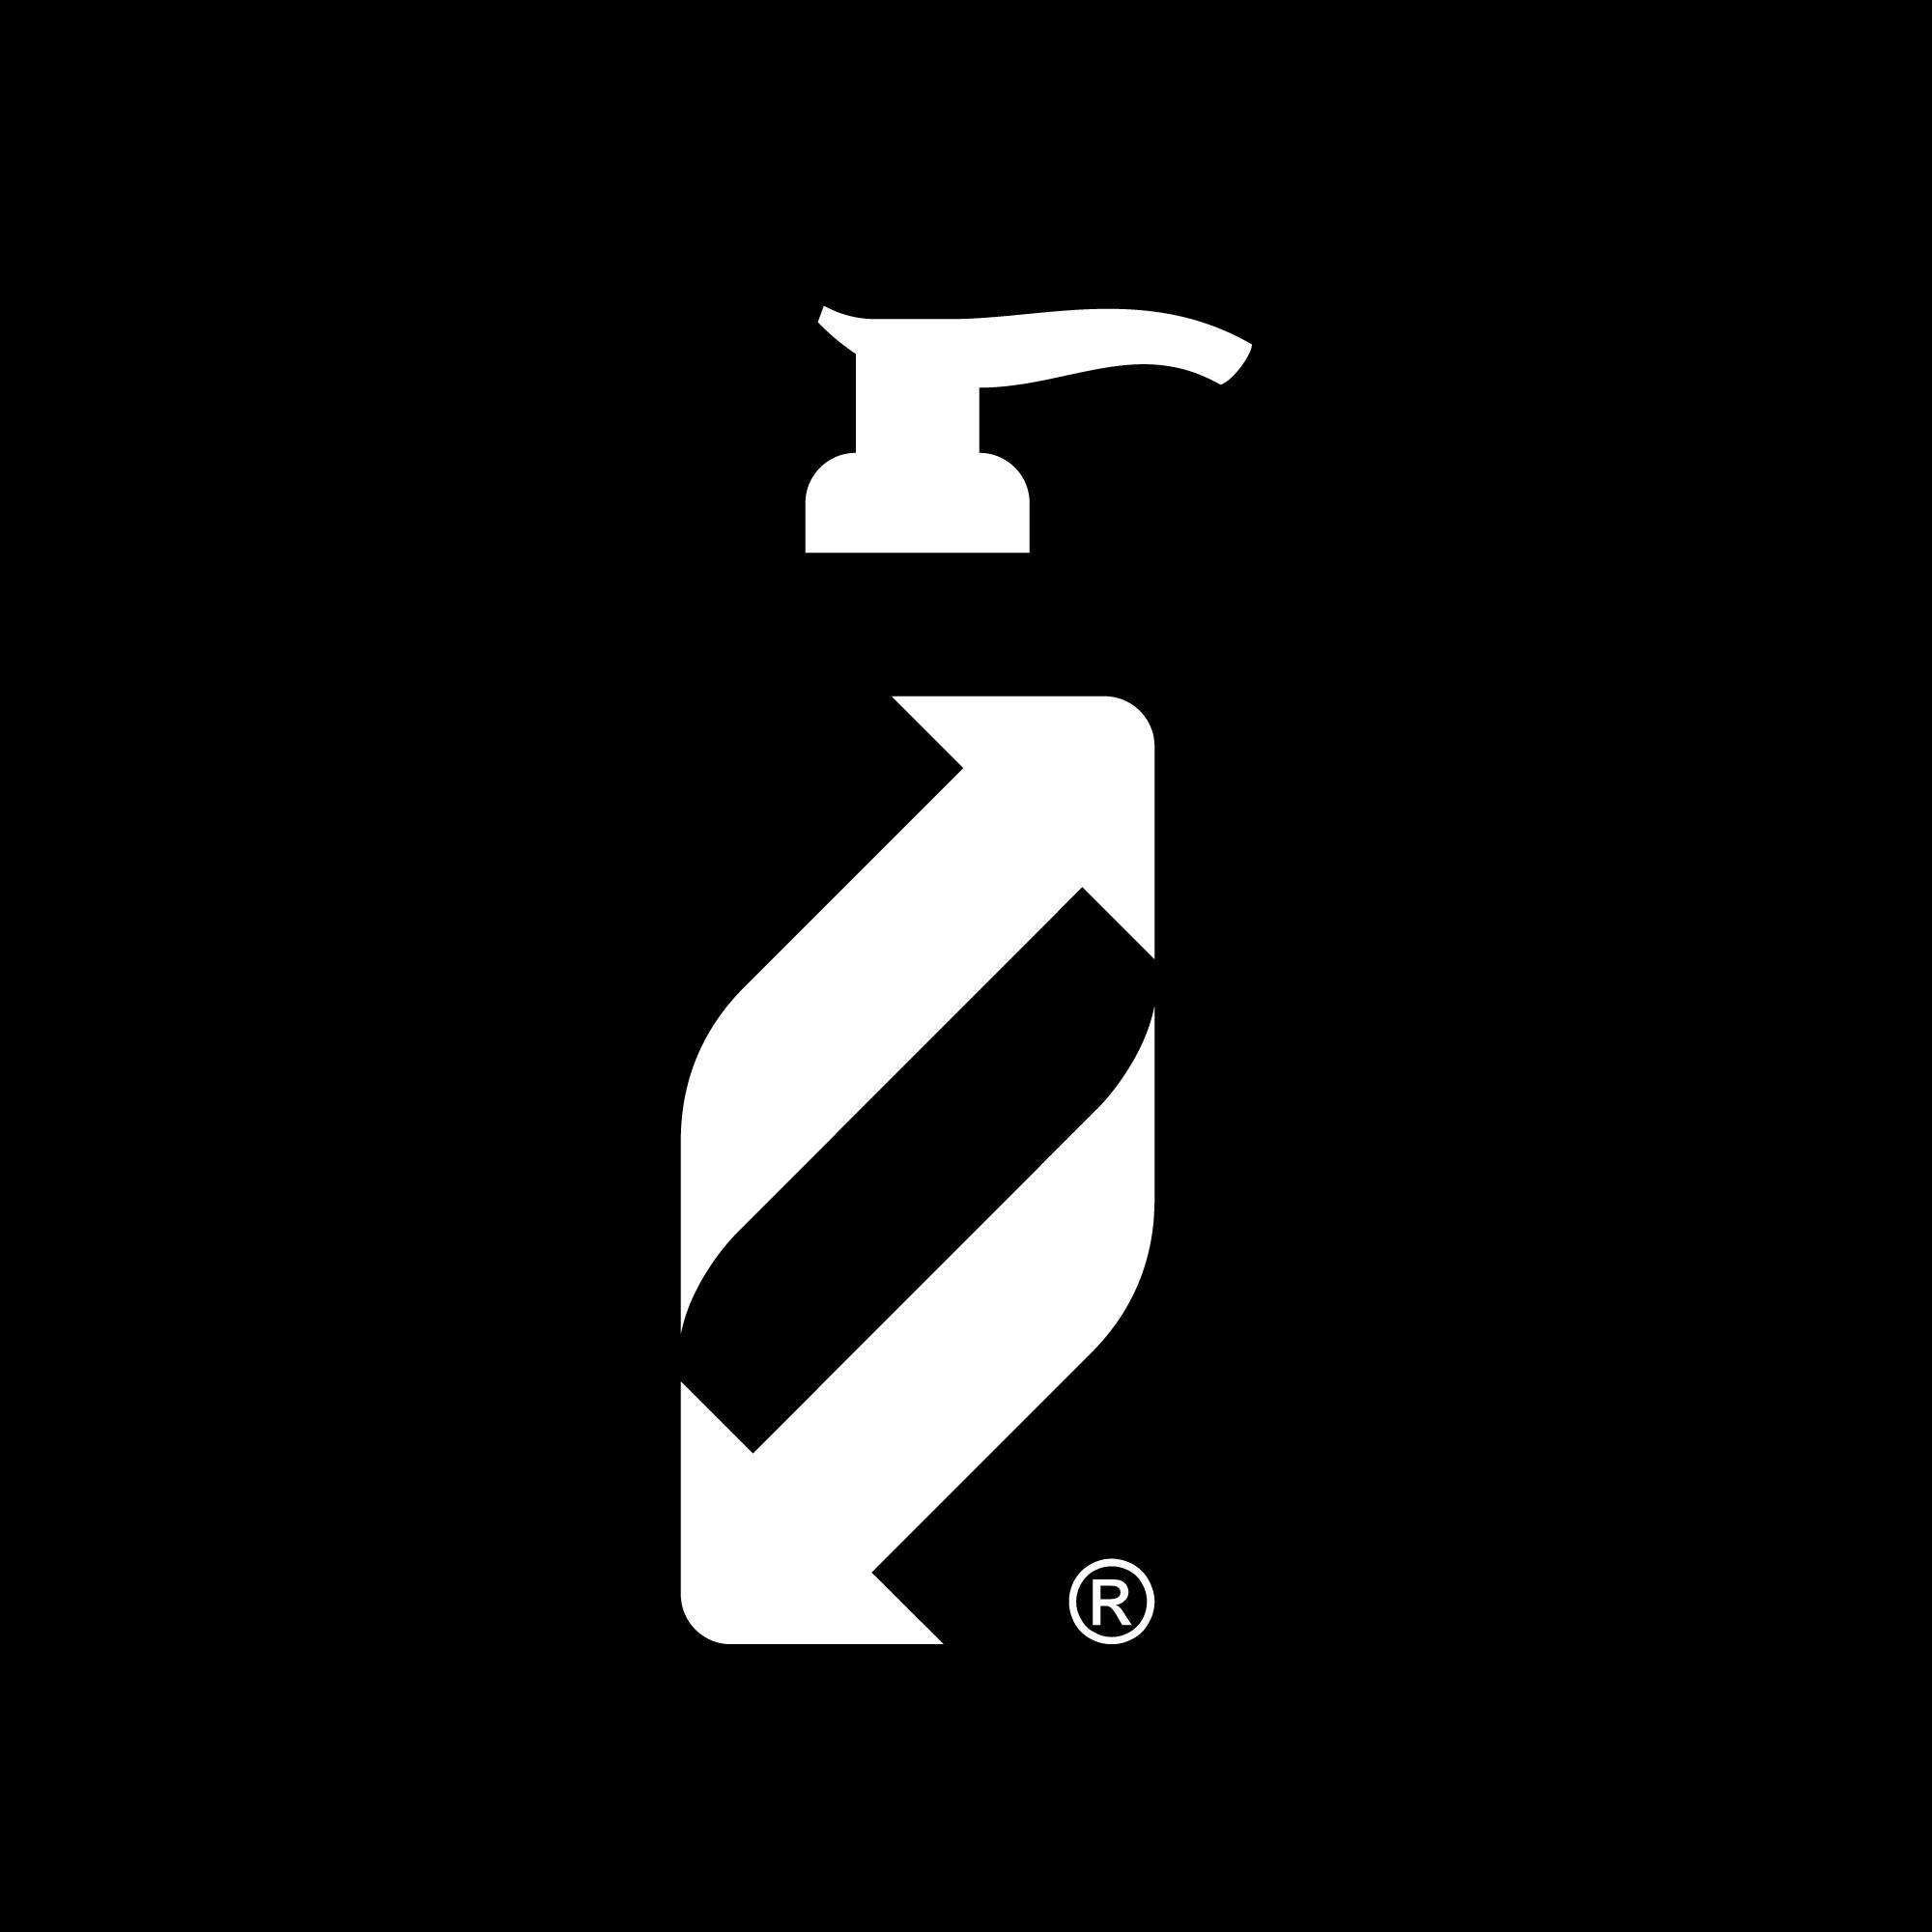 Impactful logo design for zero waste business